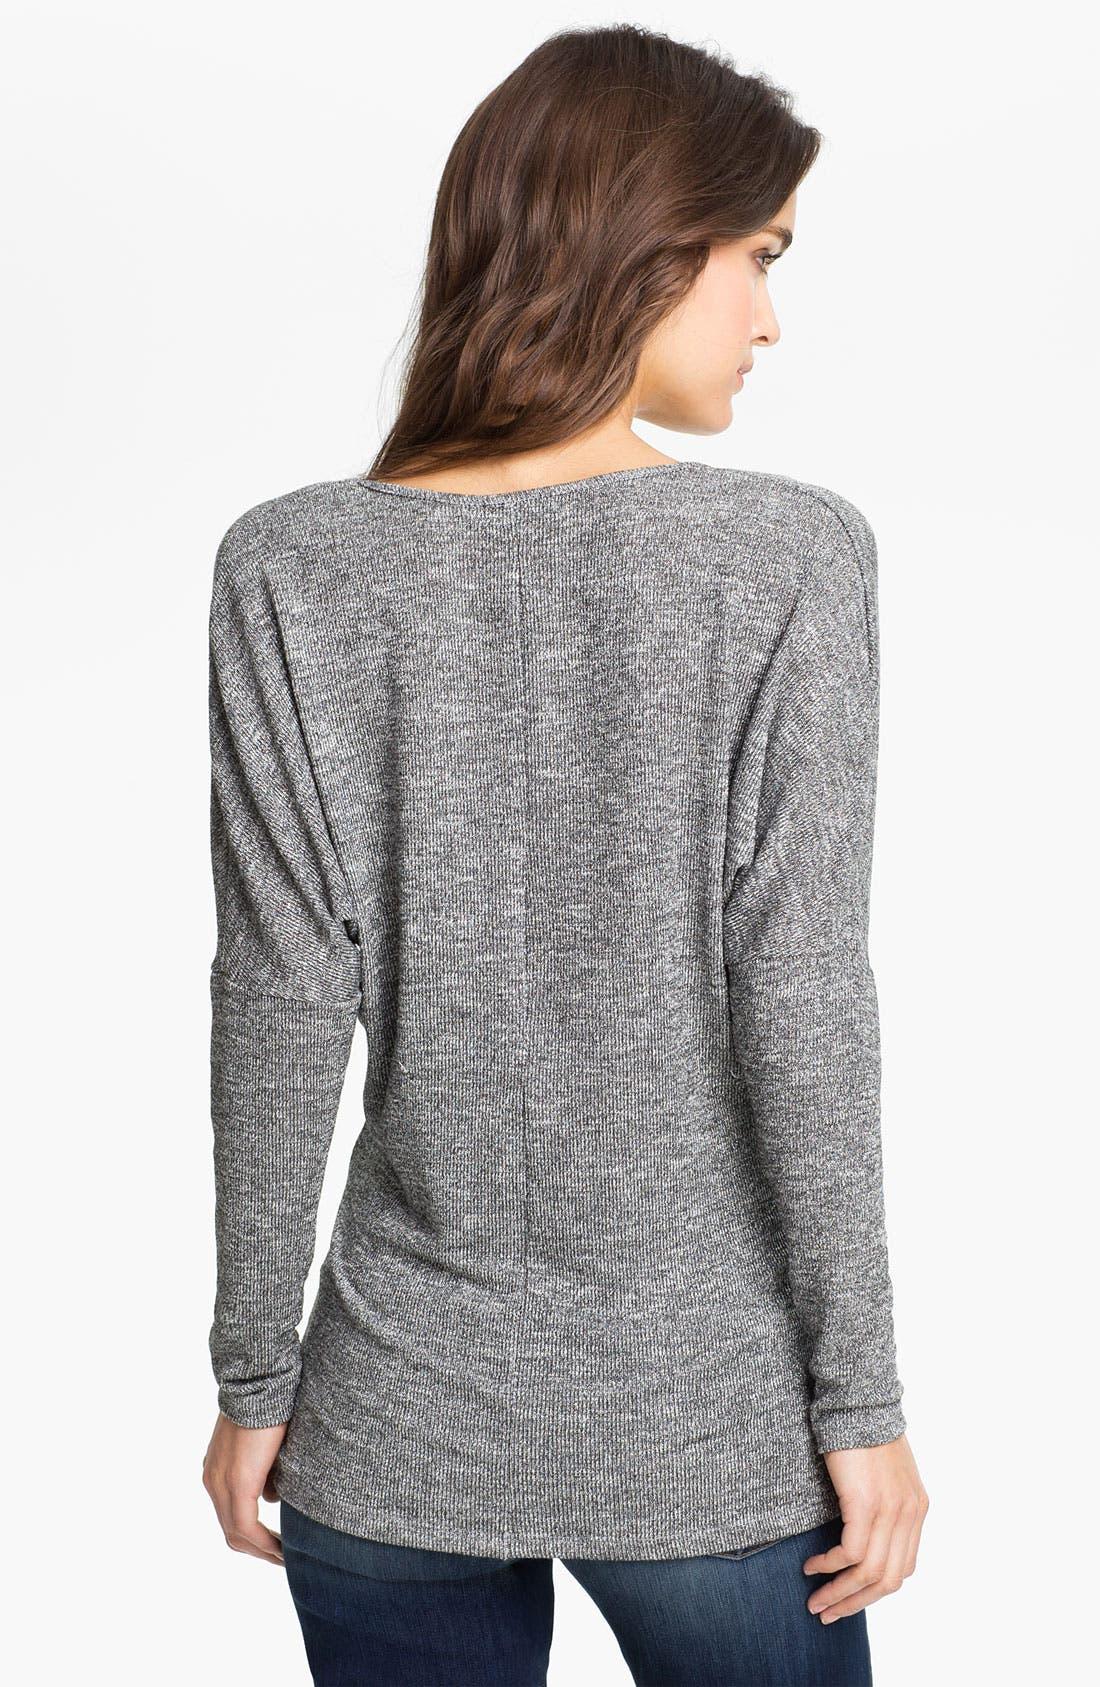 Alternate Image 2  - Velvet Oversized Metallic Sweater (Nordstrom Exclusive)